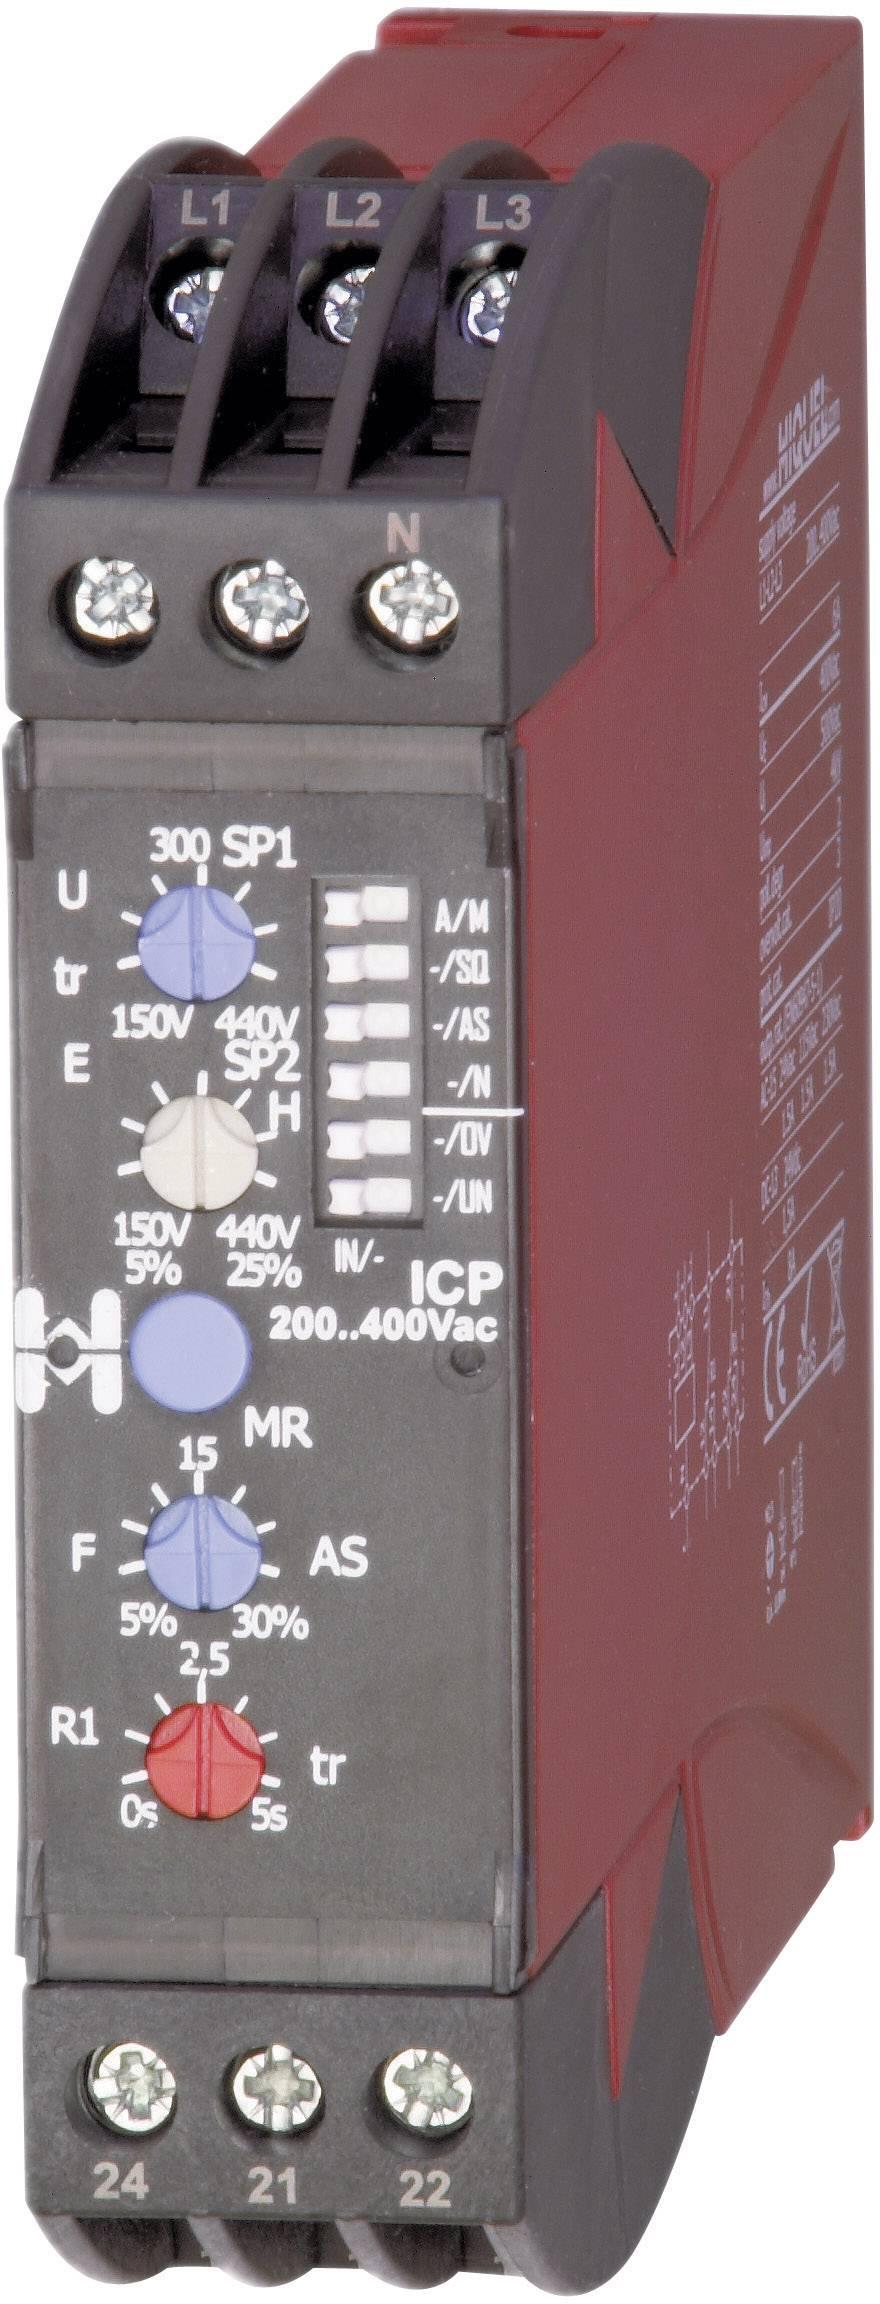 Kontrolné relé Hiquel ICP 200...400Vac ICP 200...400Vac